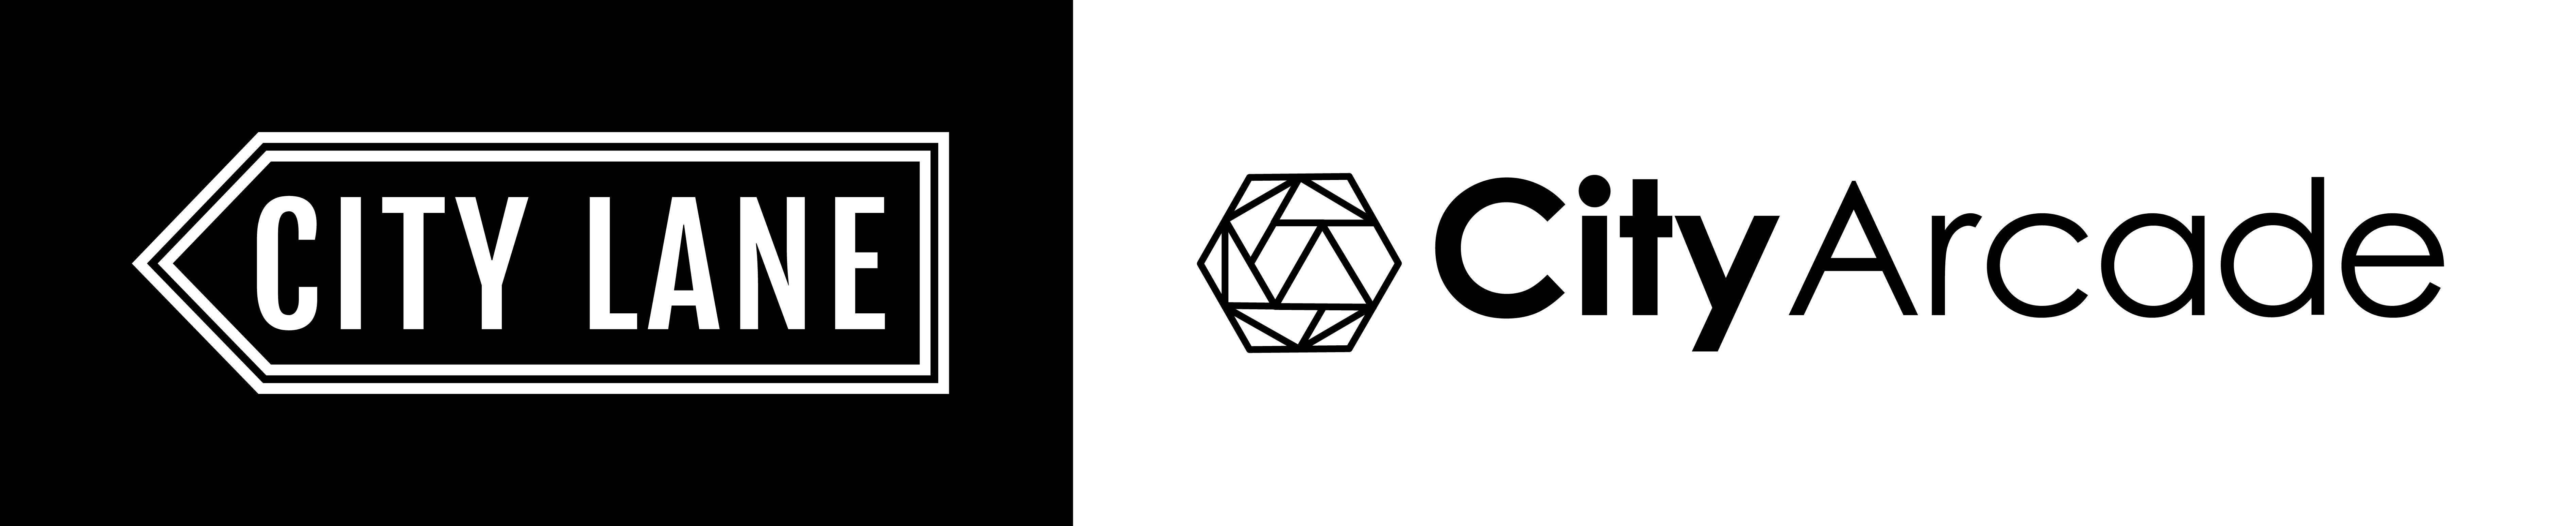 City Lane City Arcade Co Branding Logo Design 2016_Landscape_MONO_[H]